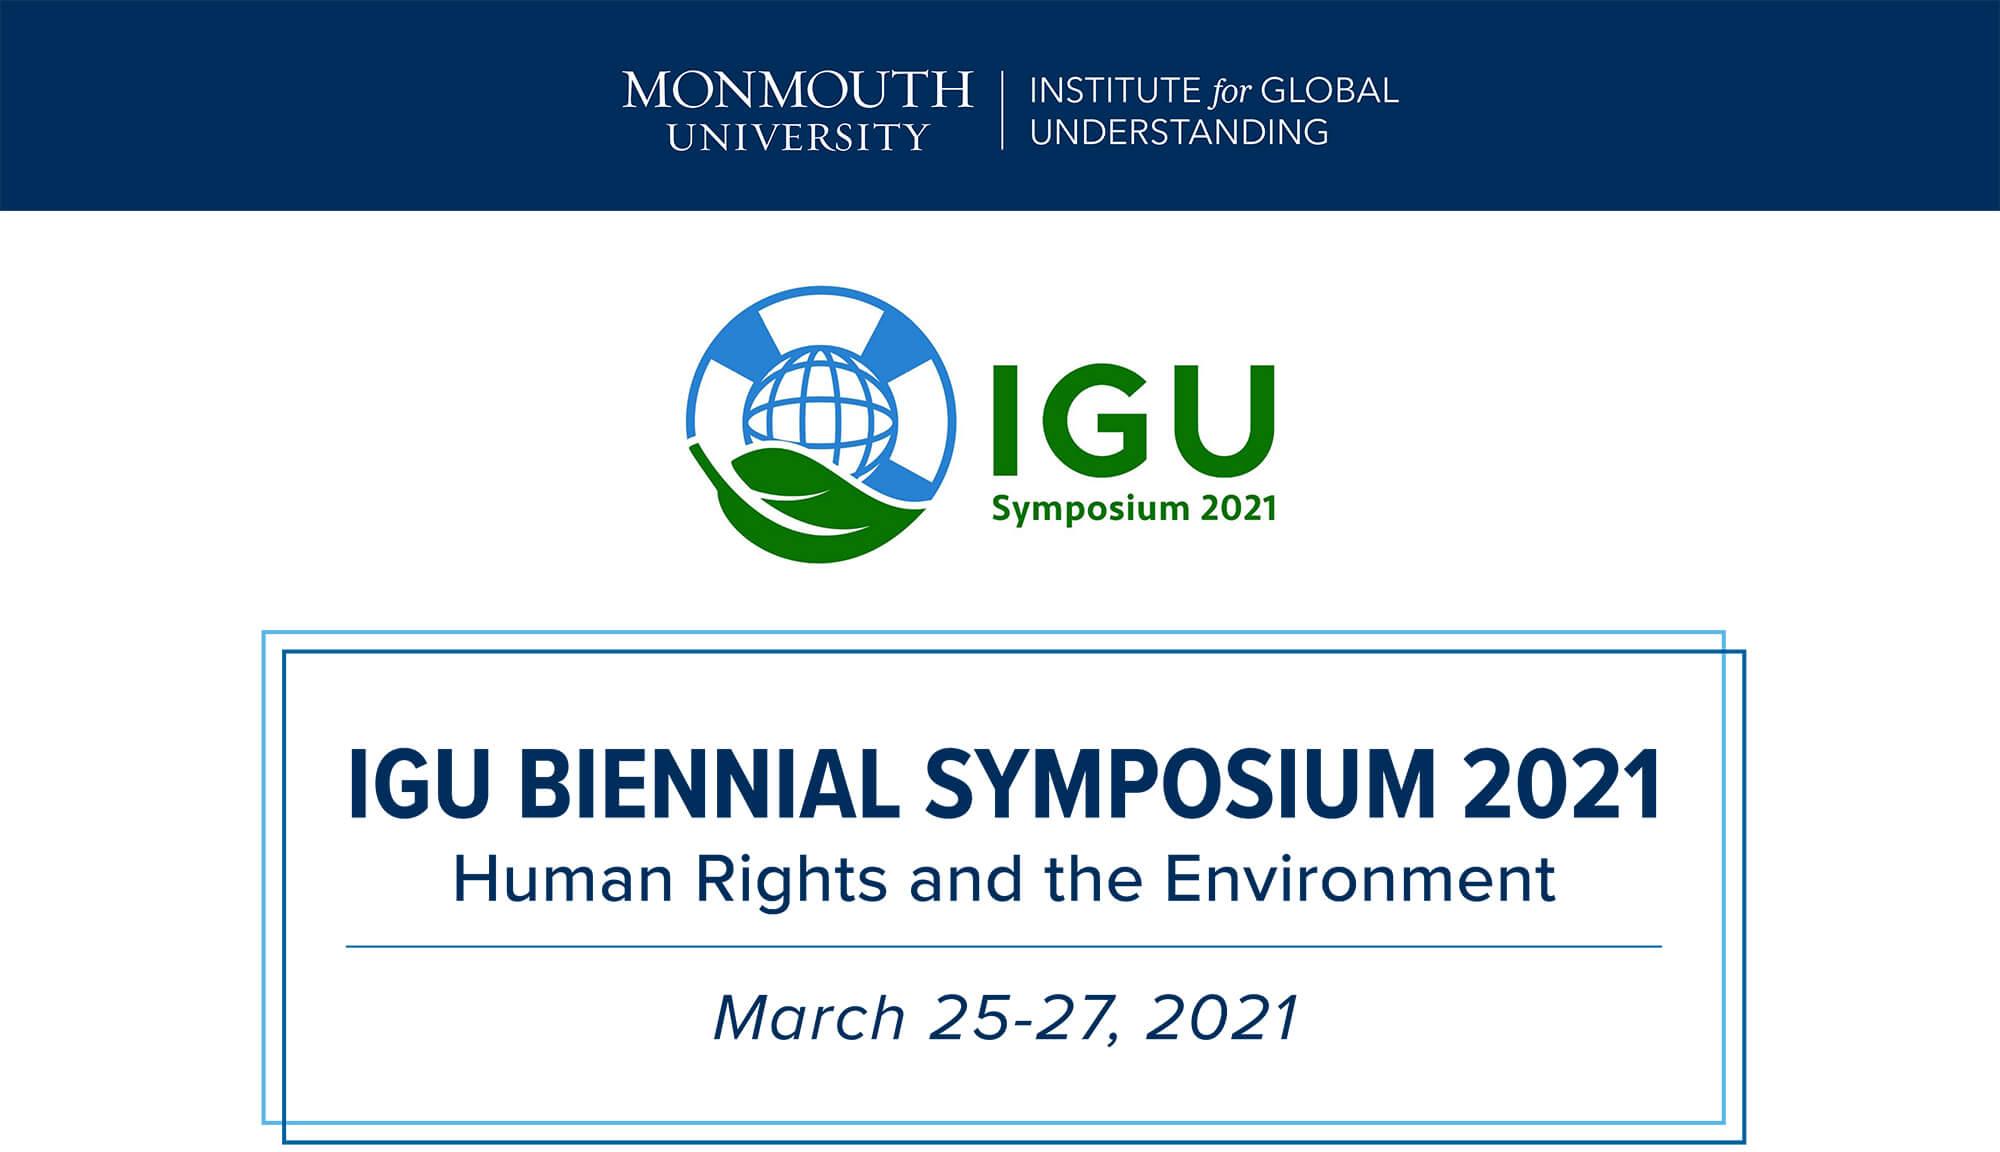 Image of 2021 IGU Biennial Symposium Program Cover